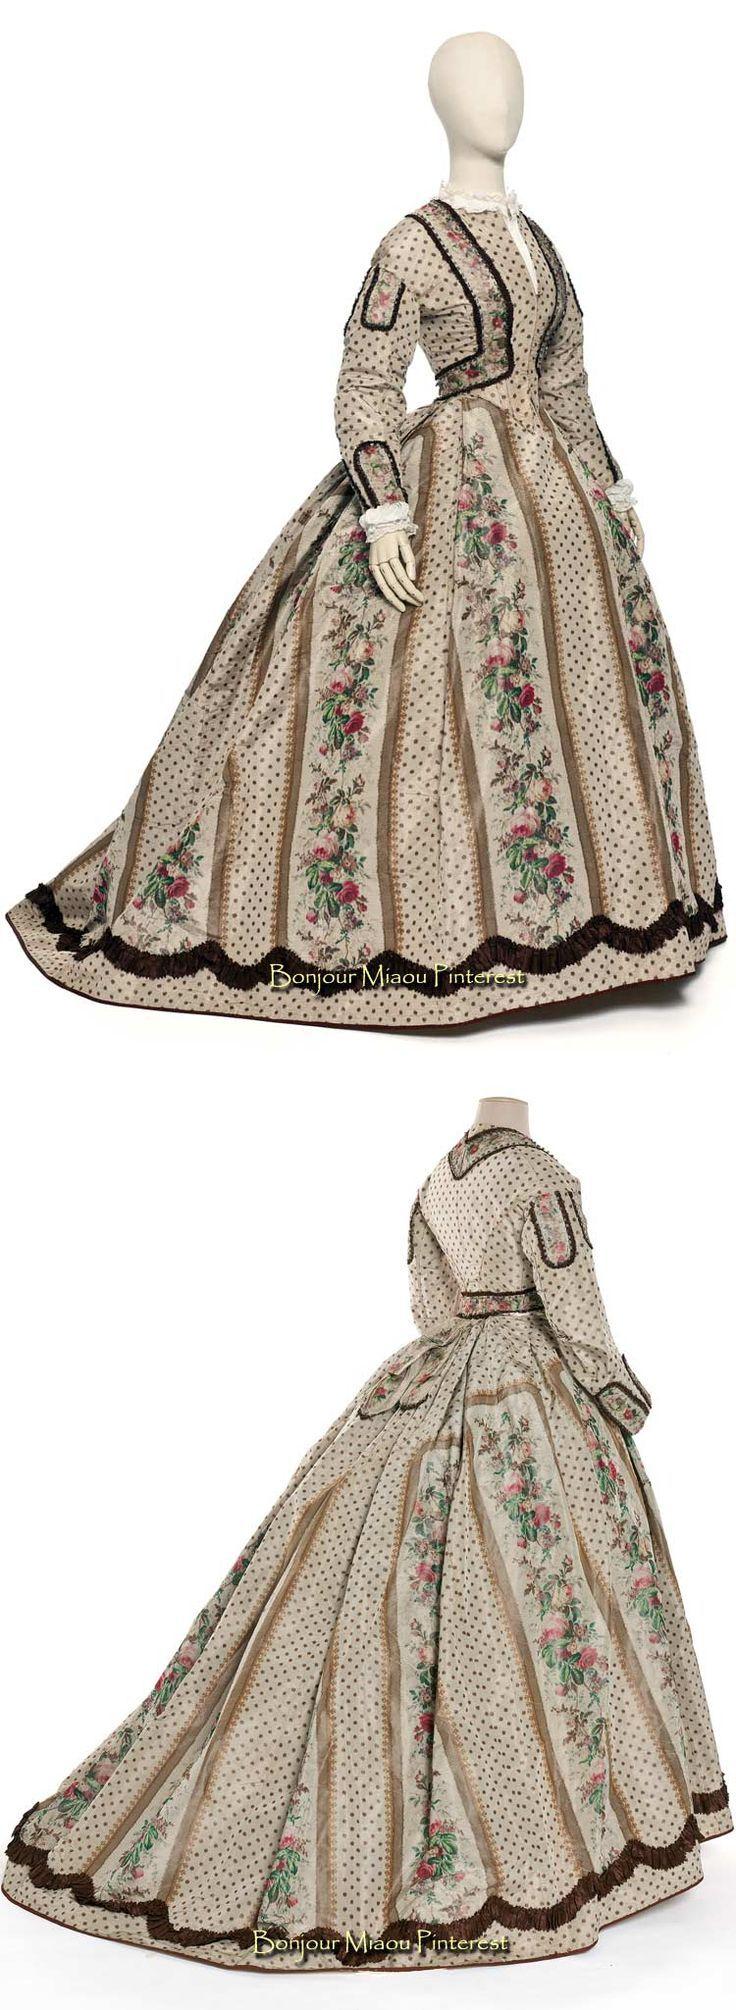 Afternoon dress, 1860. Silk taffeta, two pieces. Photos: Jean Tholance. Les Arts Décoratifs and Europeana Fashion